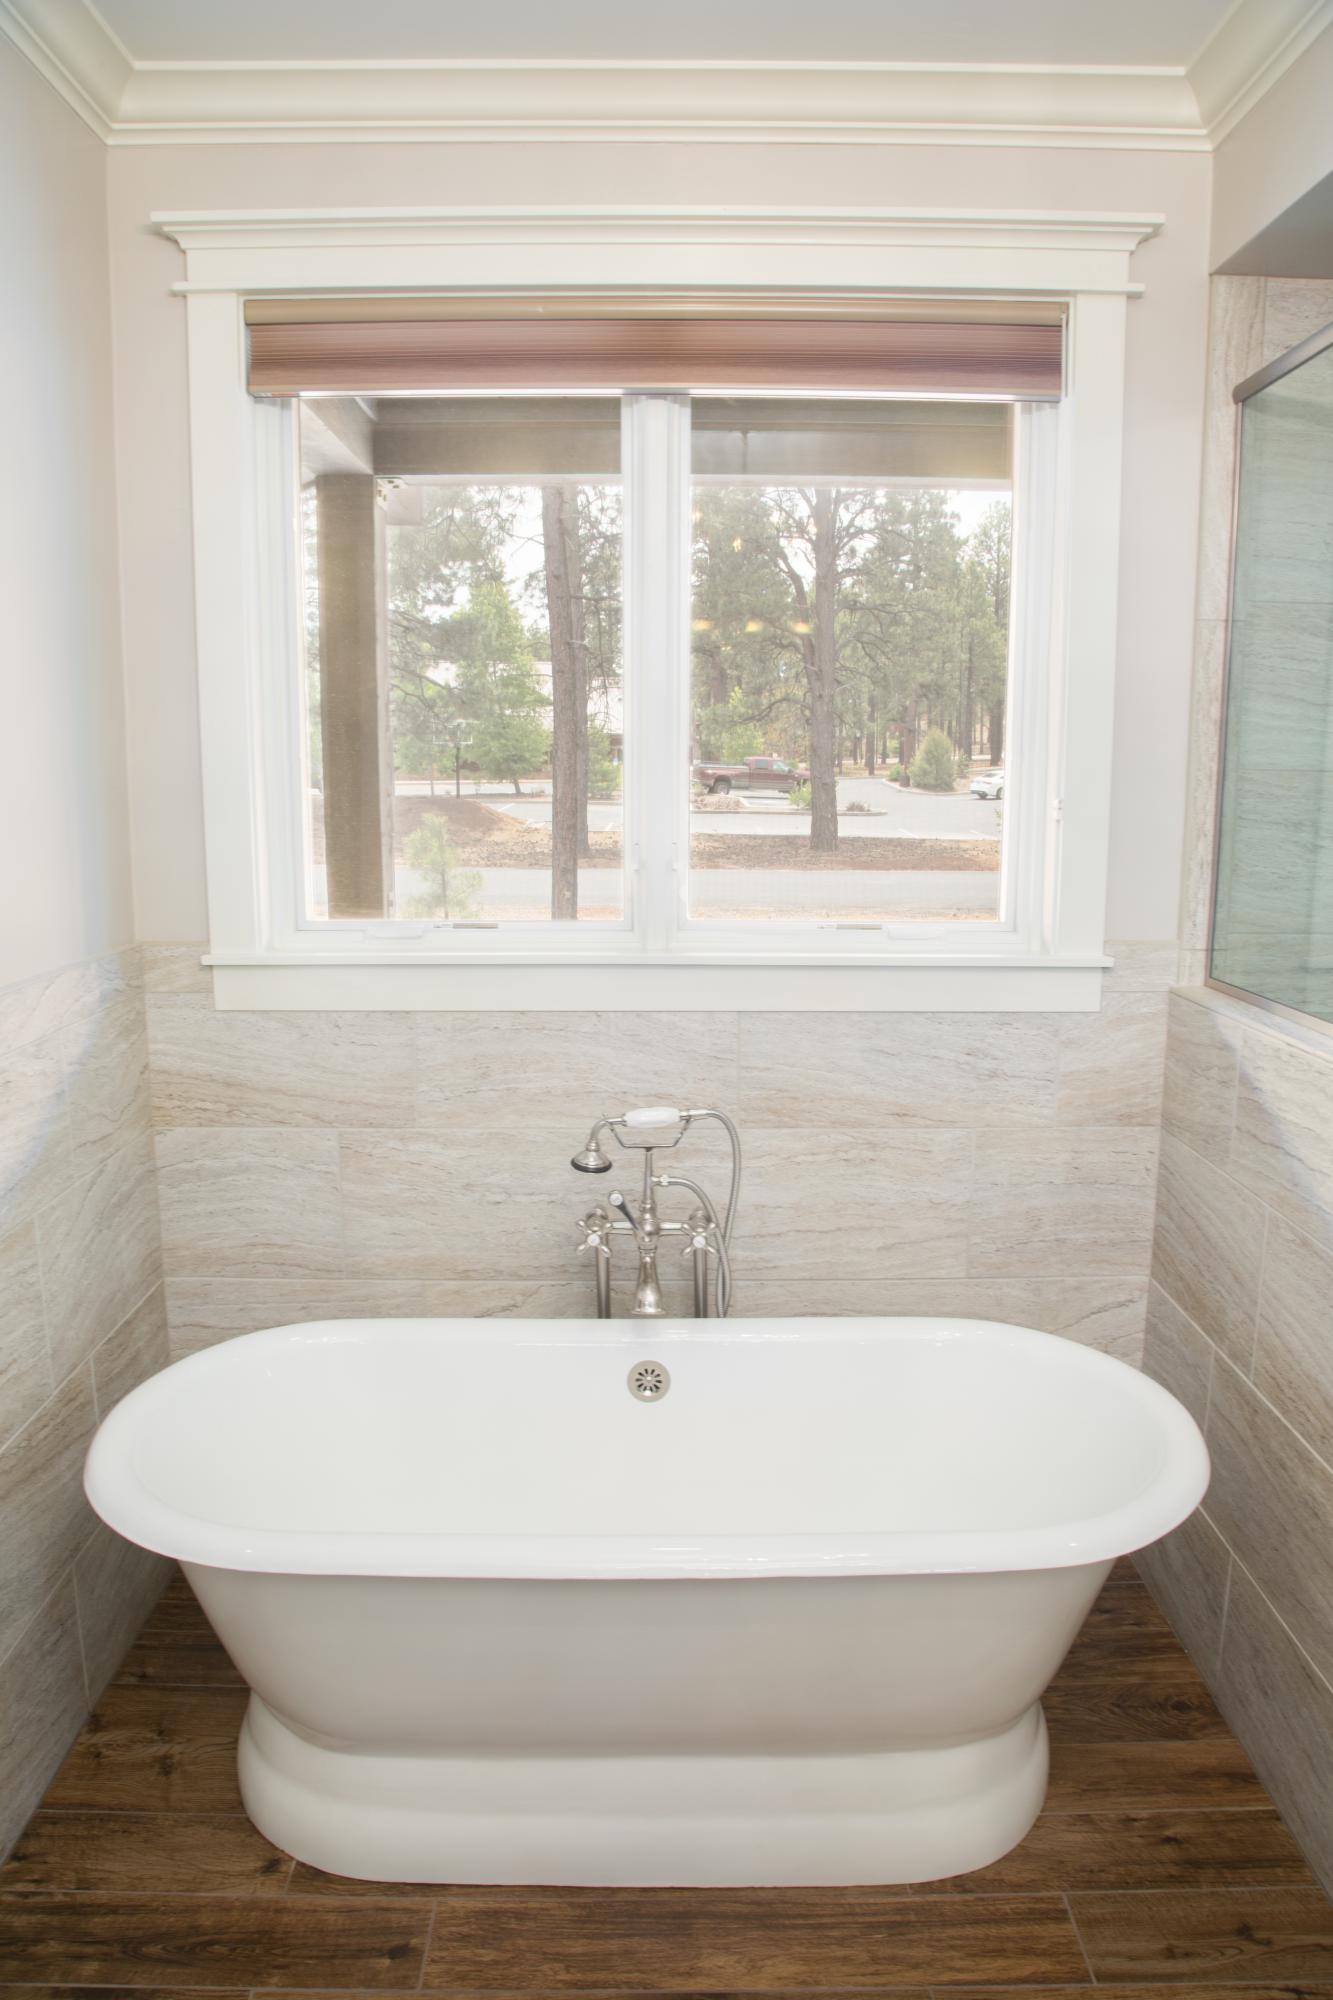 Bathroom featured in the Aspen Shadows Plan 3405 By Capstone Homes in Flagstaff, AZ